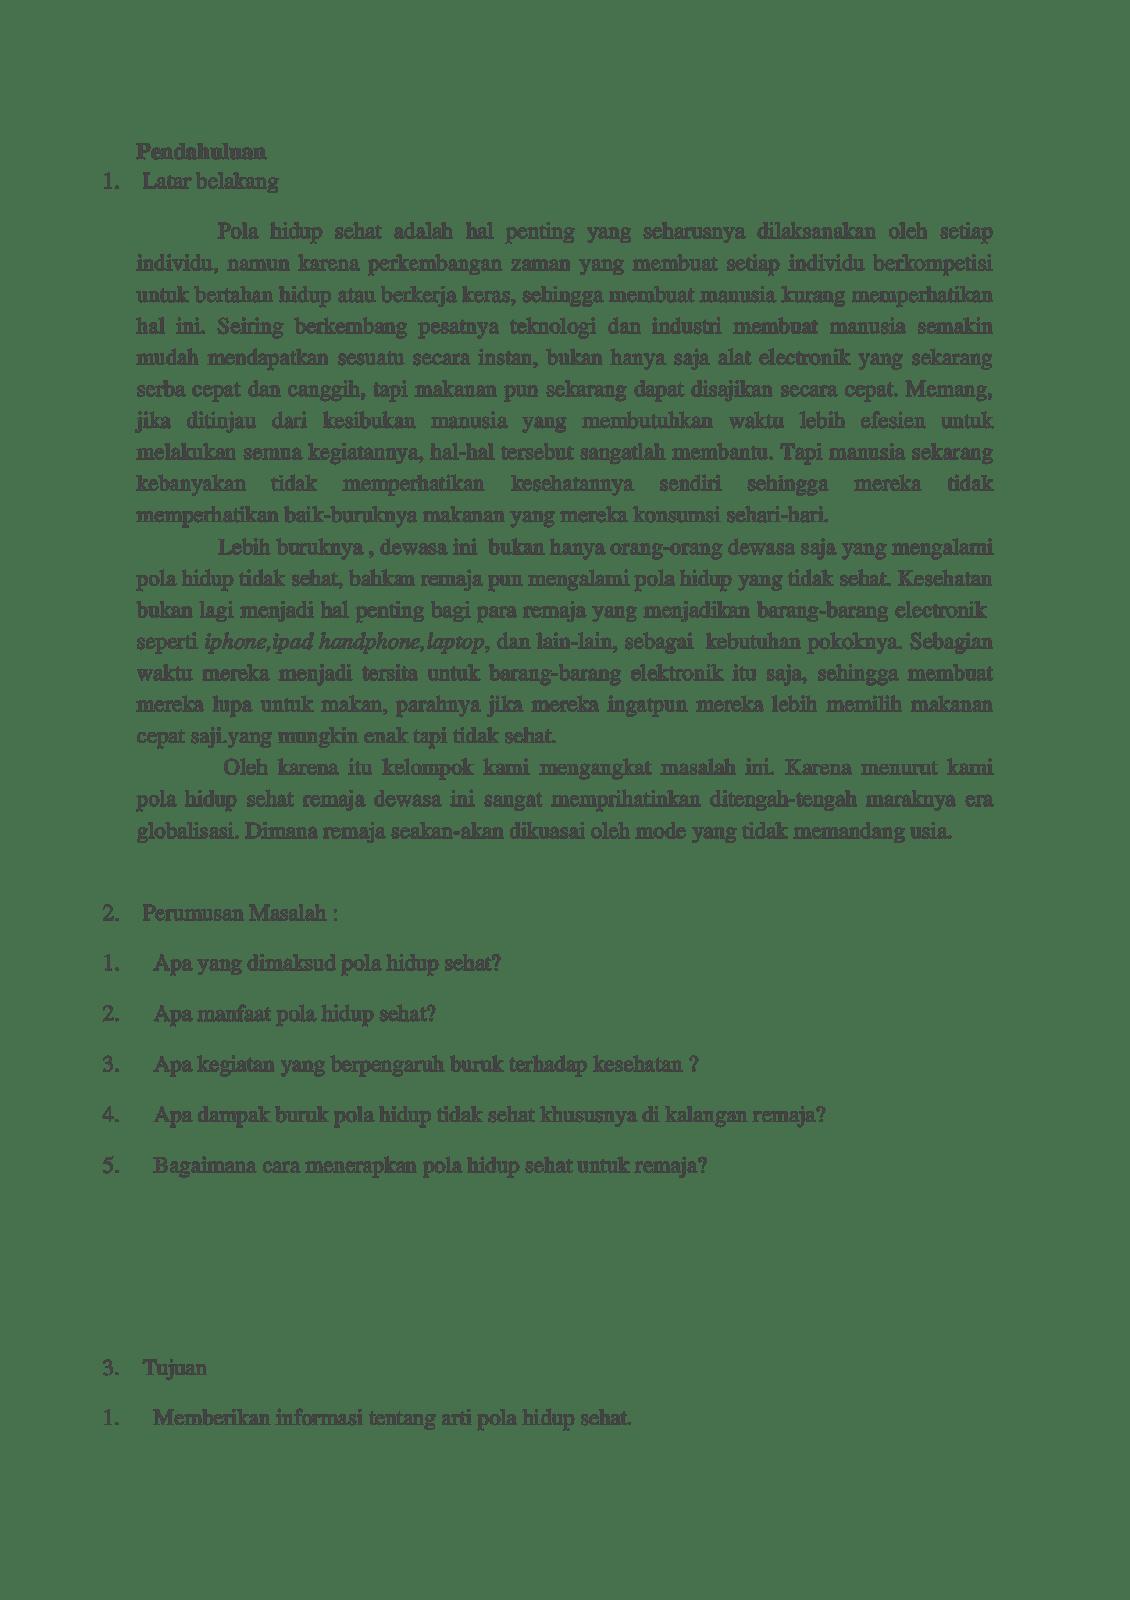 Makalah Pola Hidup Sehat Wood Scribd Indo